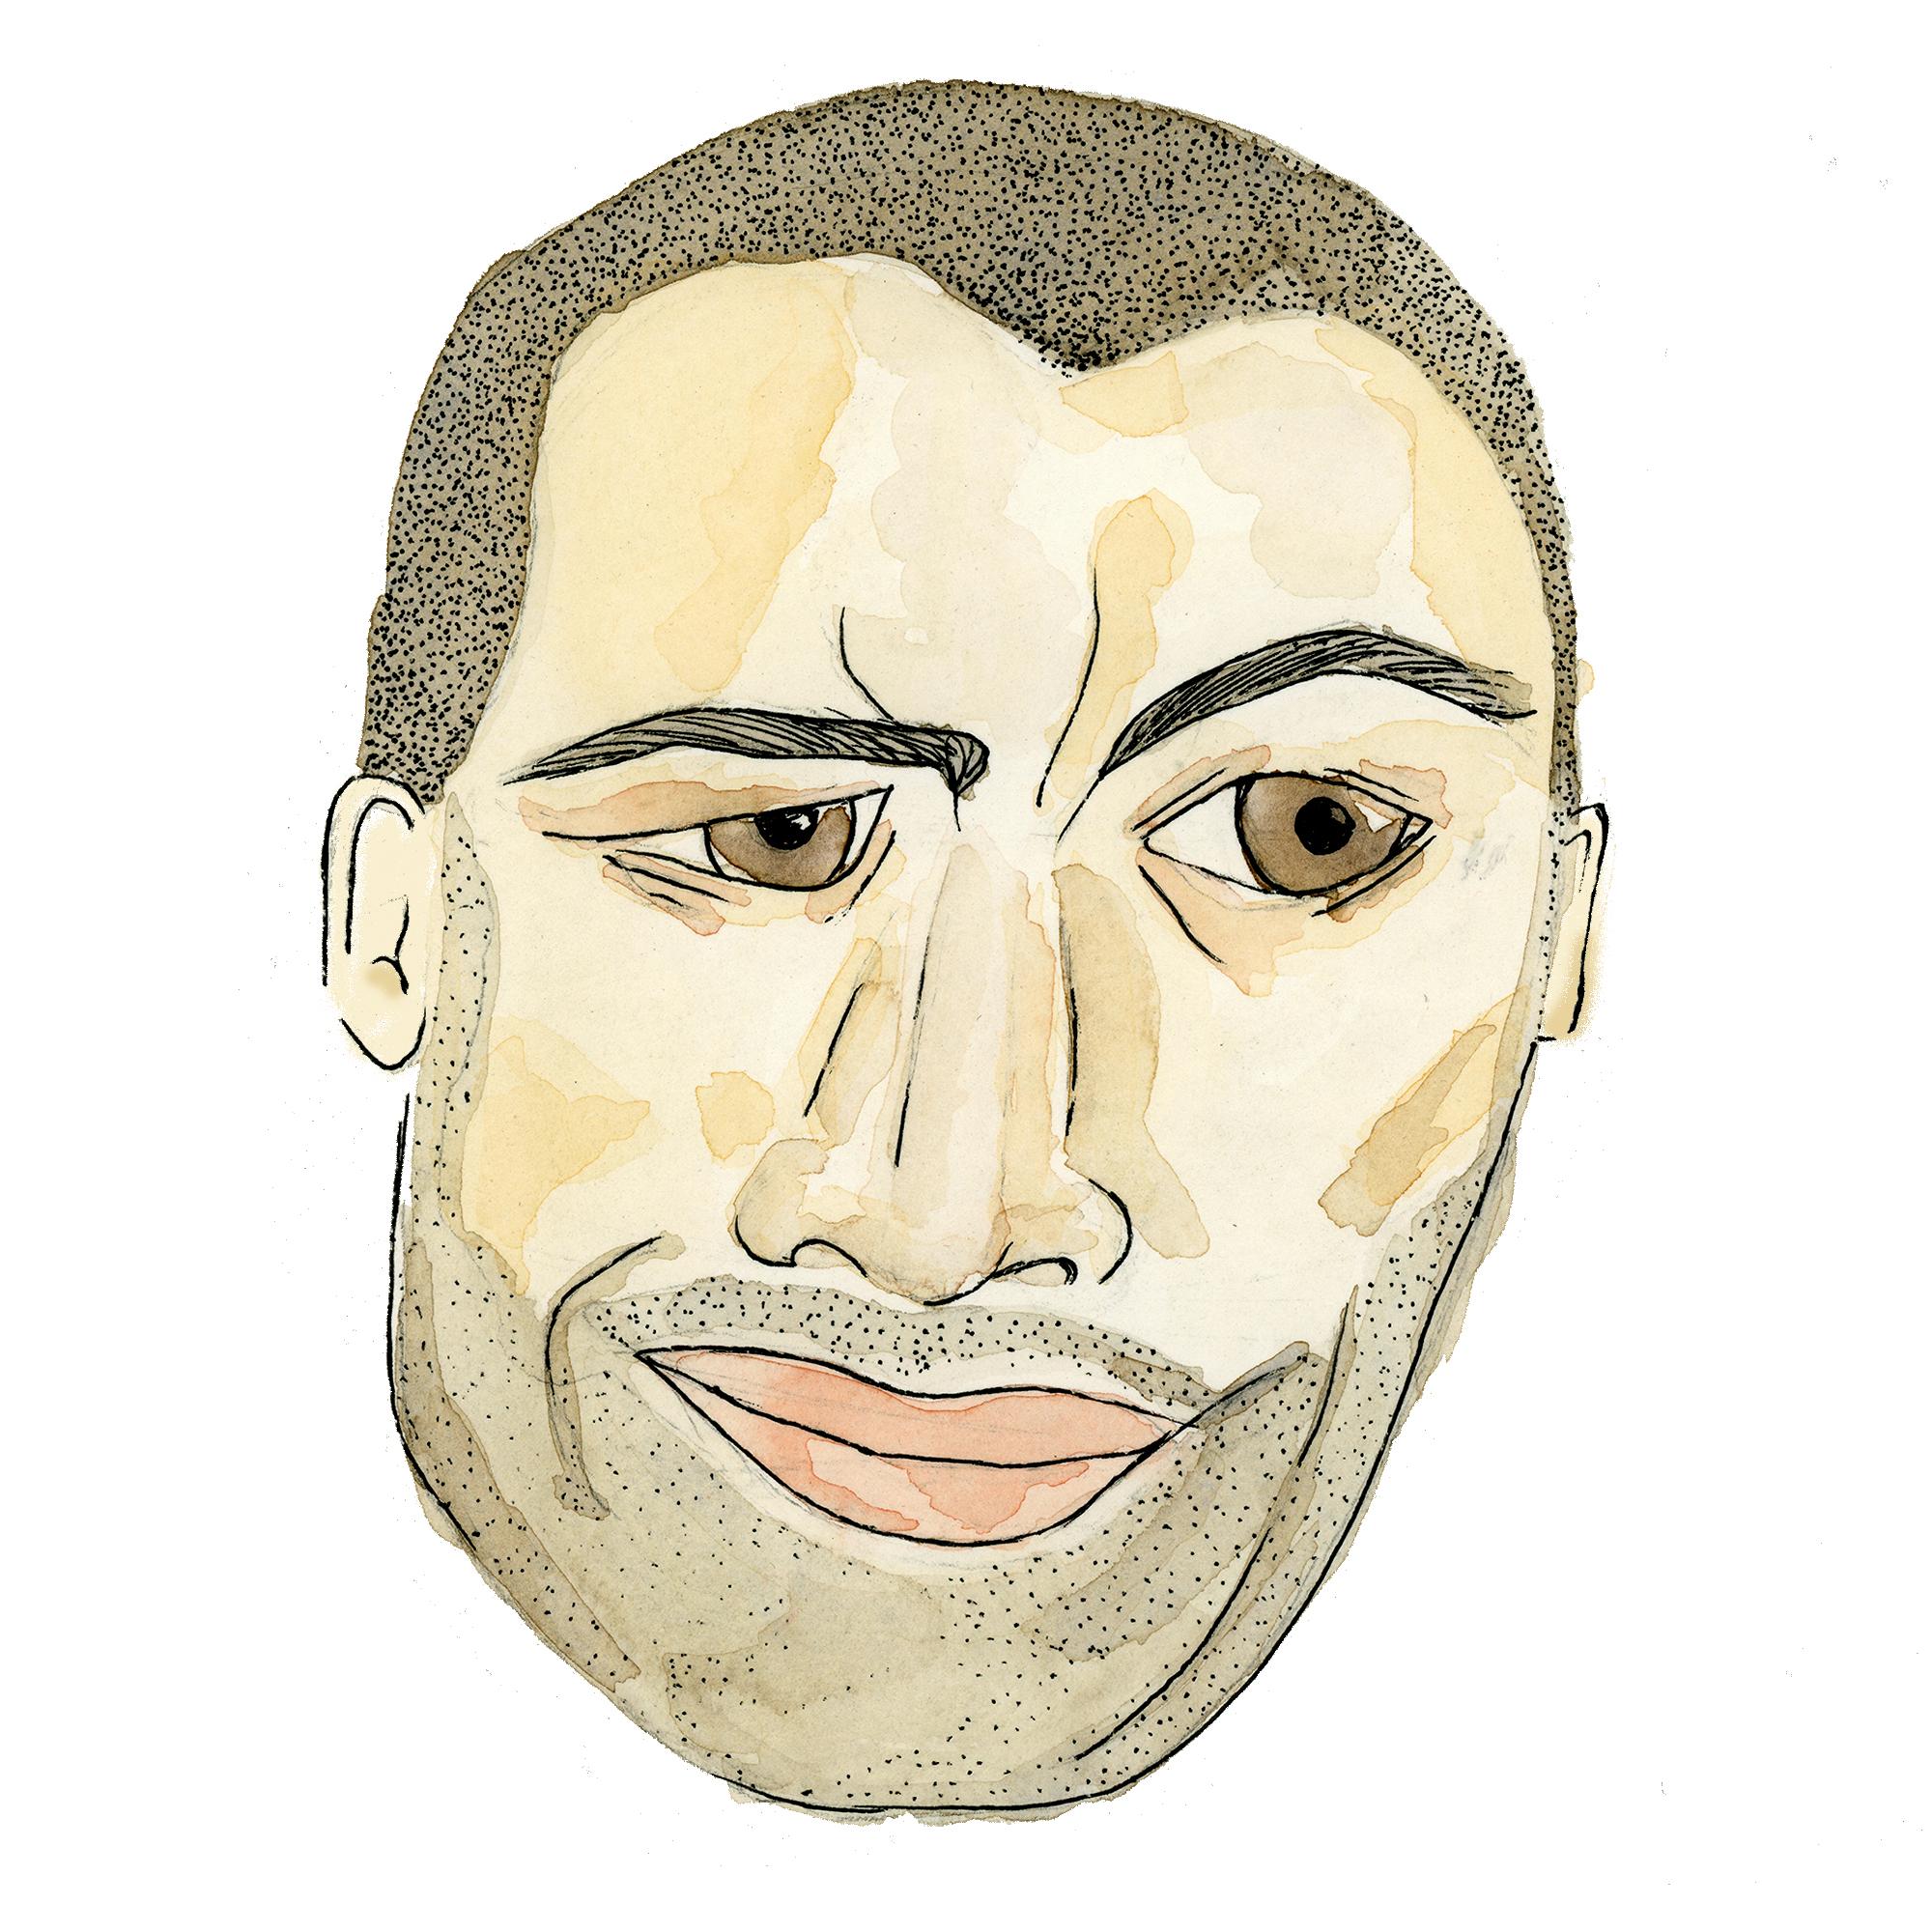 Face_Andrew_Illustrations_2000x2000_.jpg